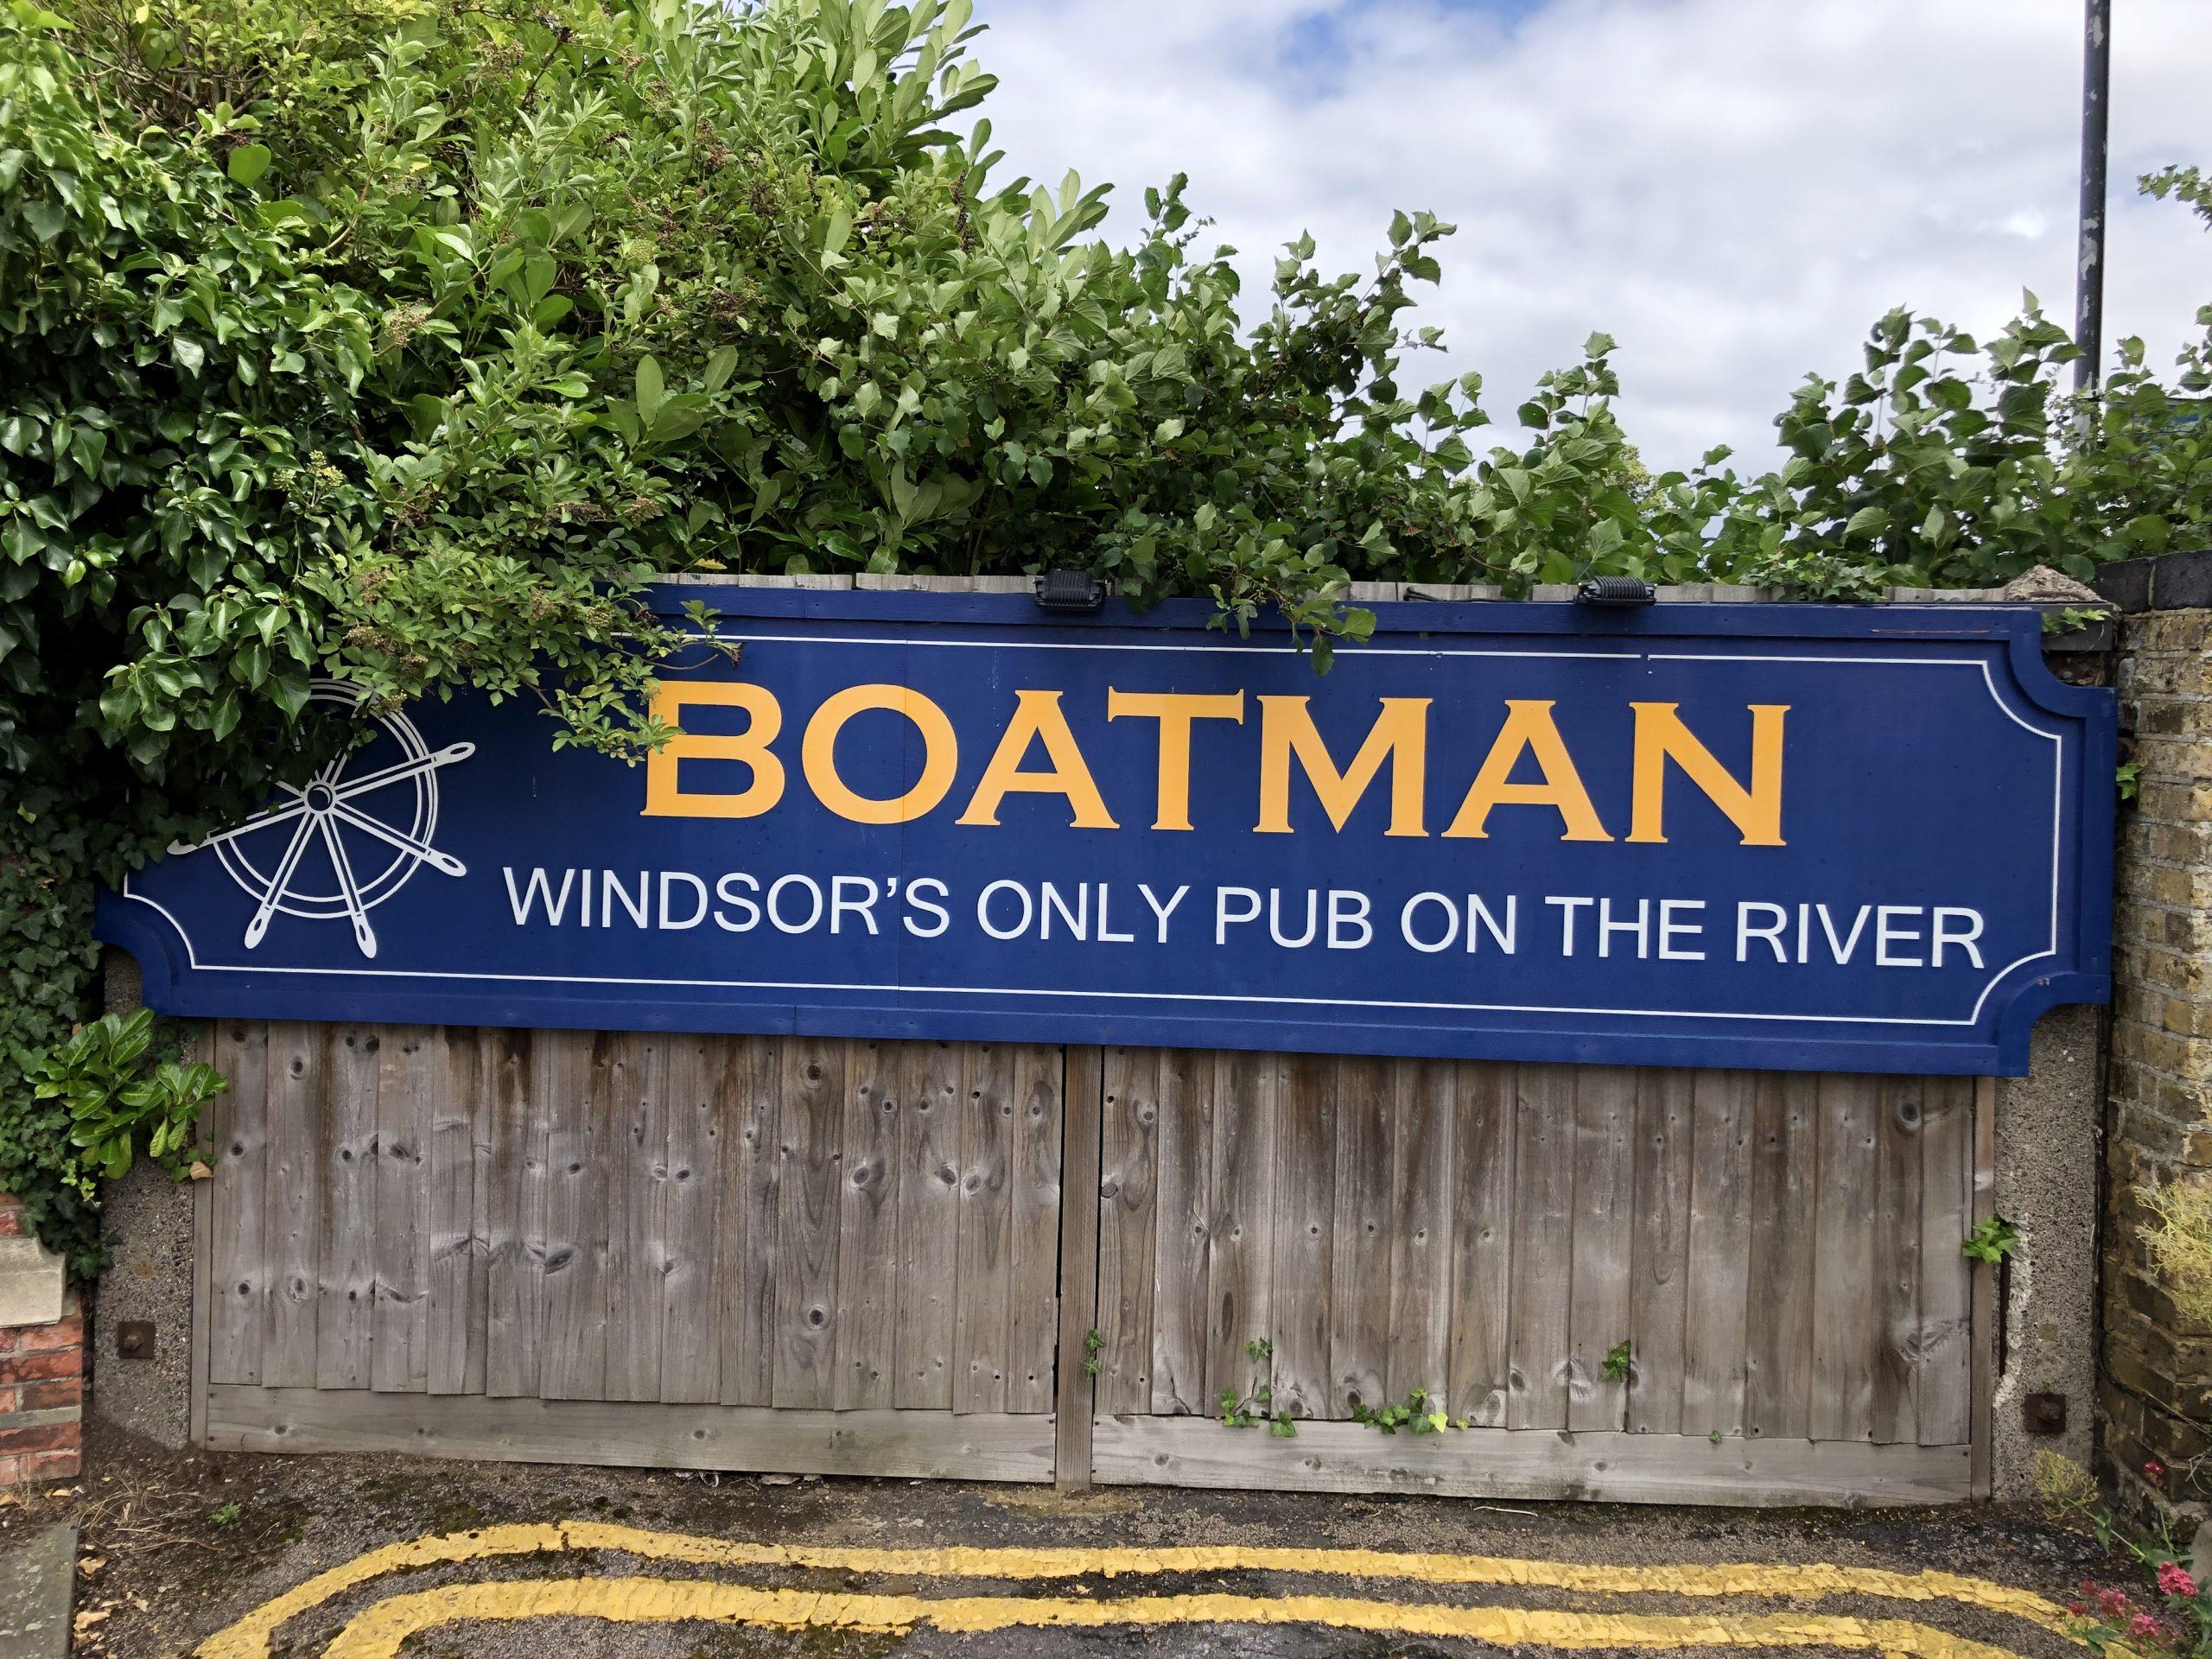 The Boatman pub in Windsor